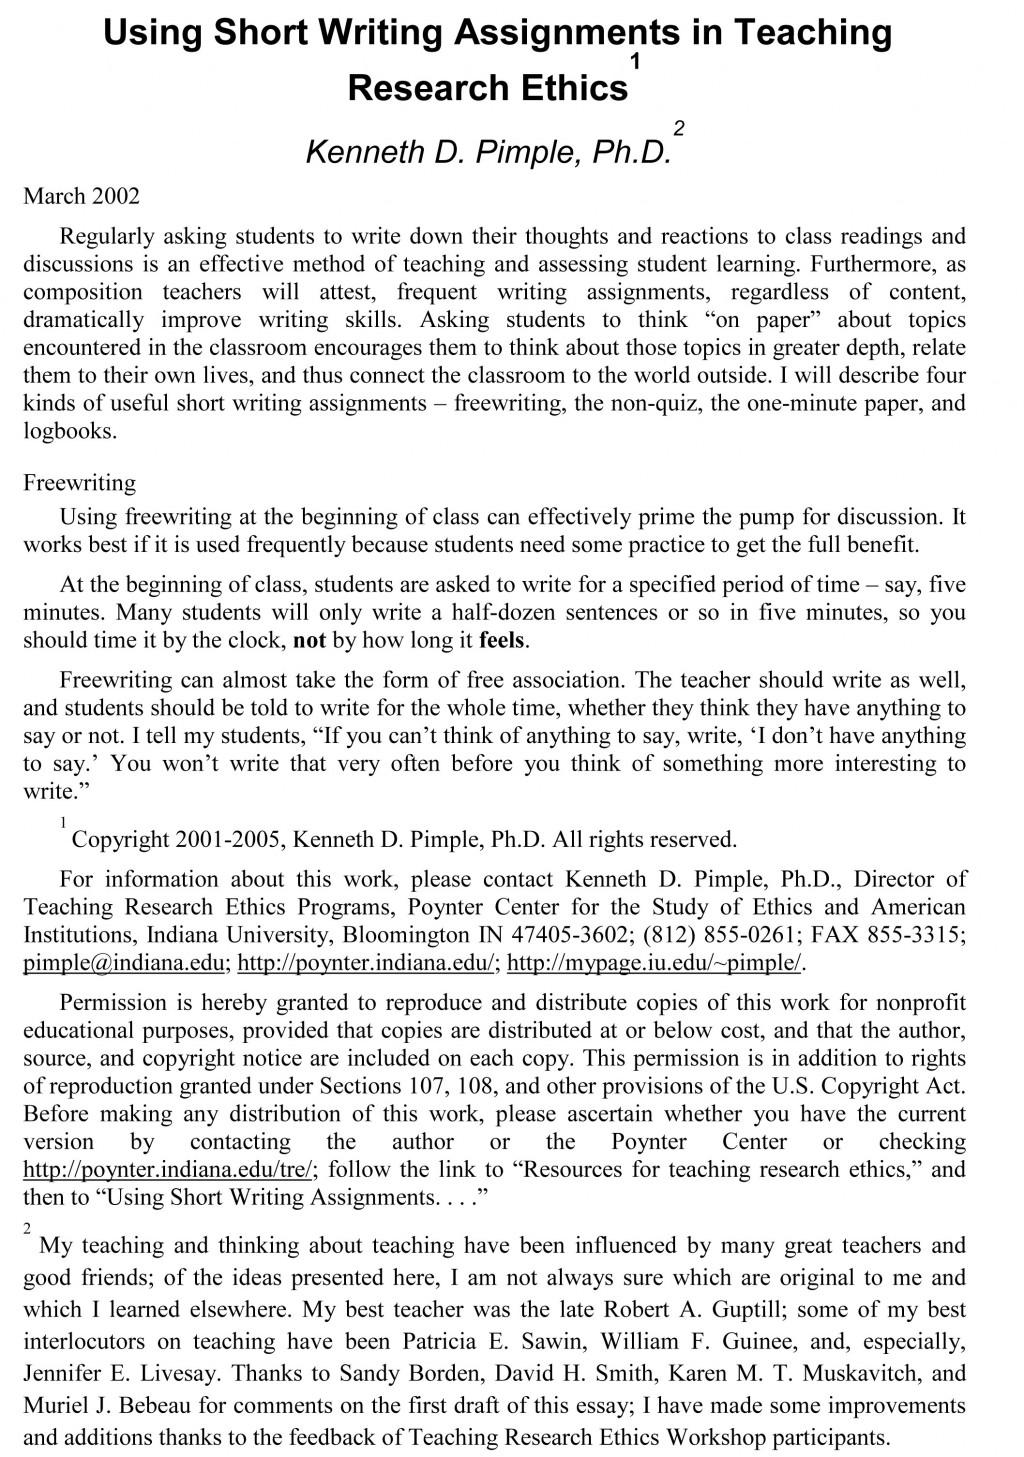 012 Essay Example Sample Teaching Remarkable Diversity Uw Law School Large